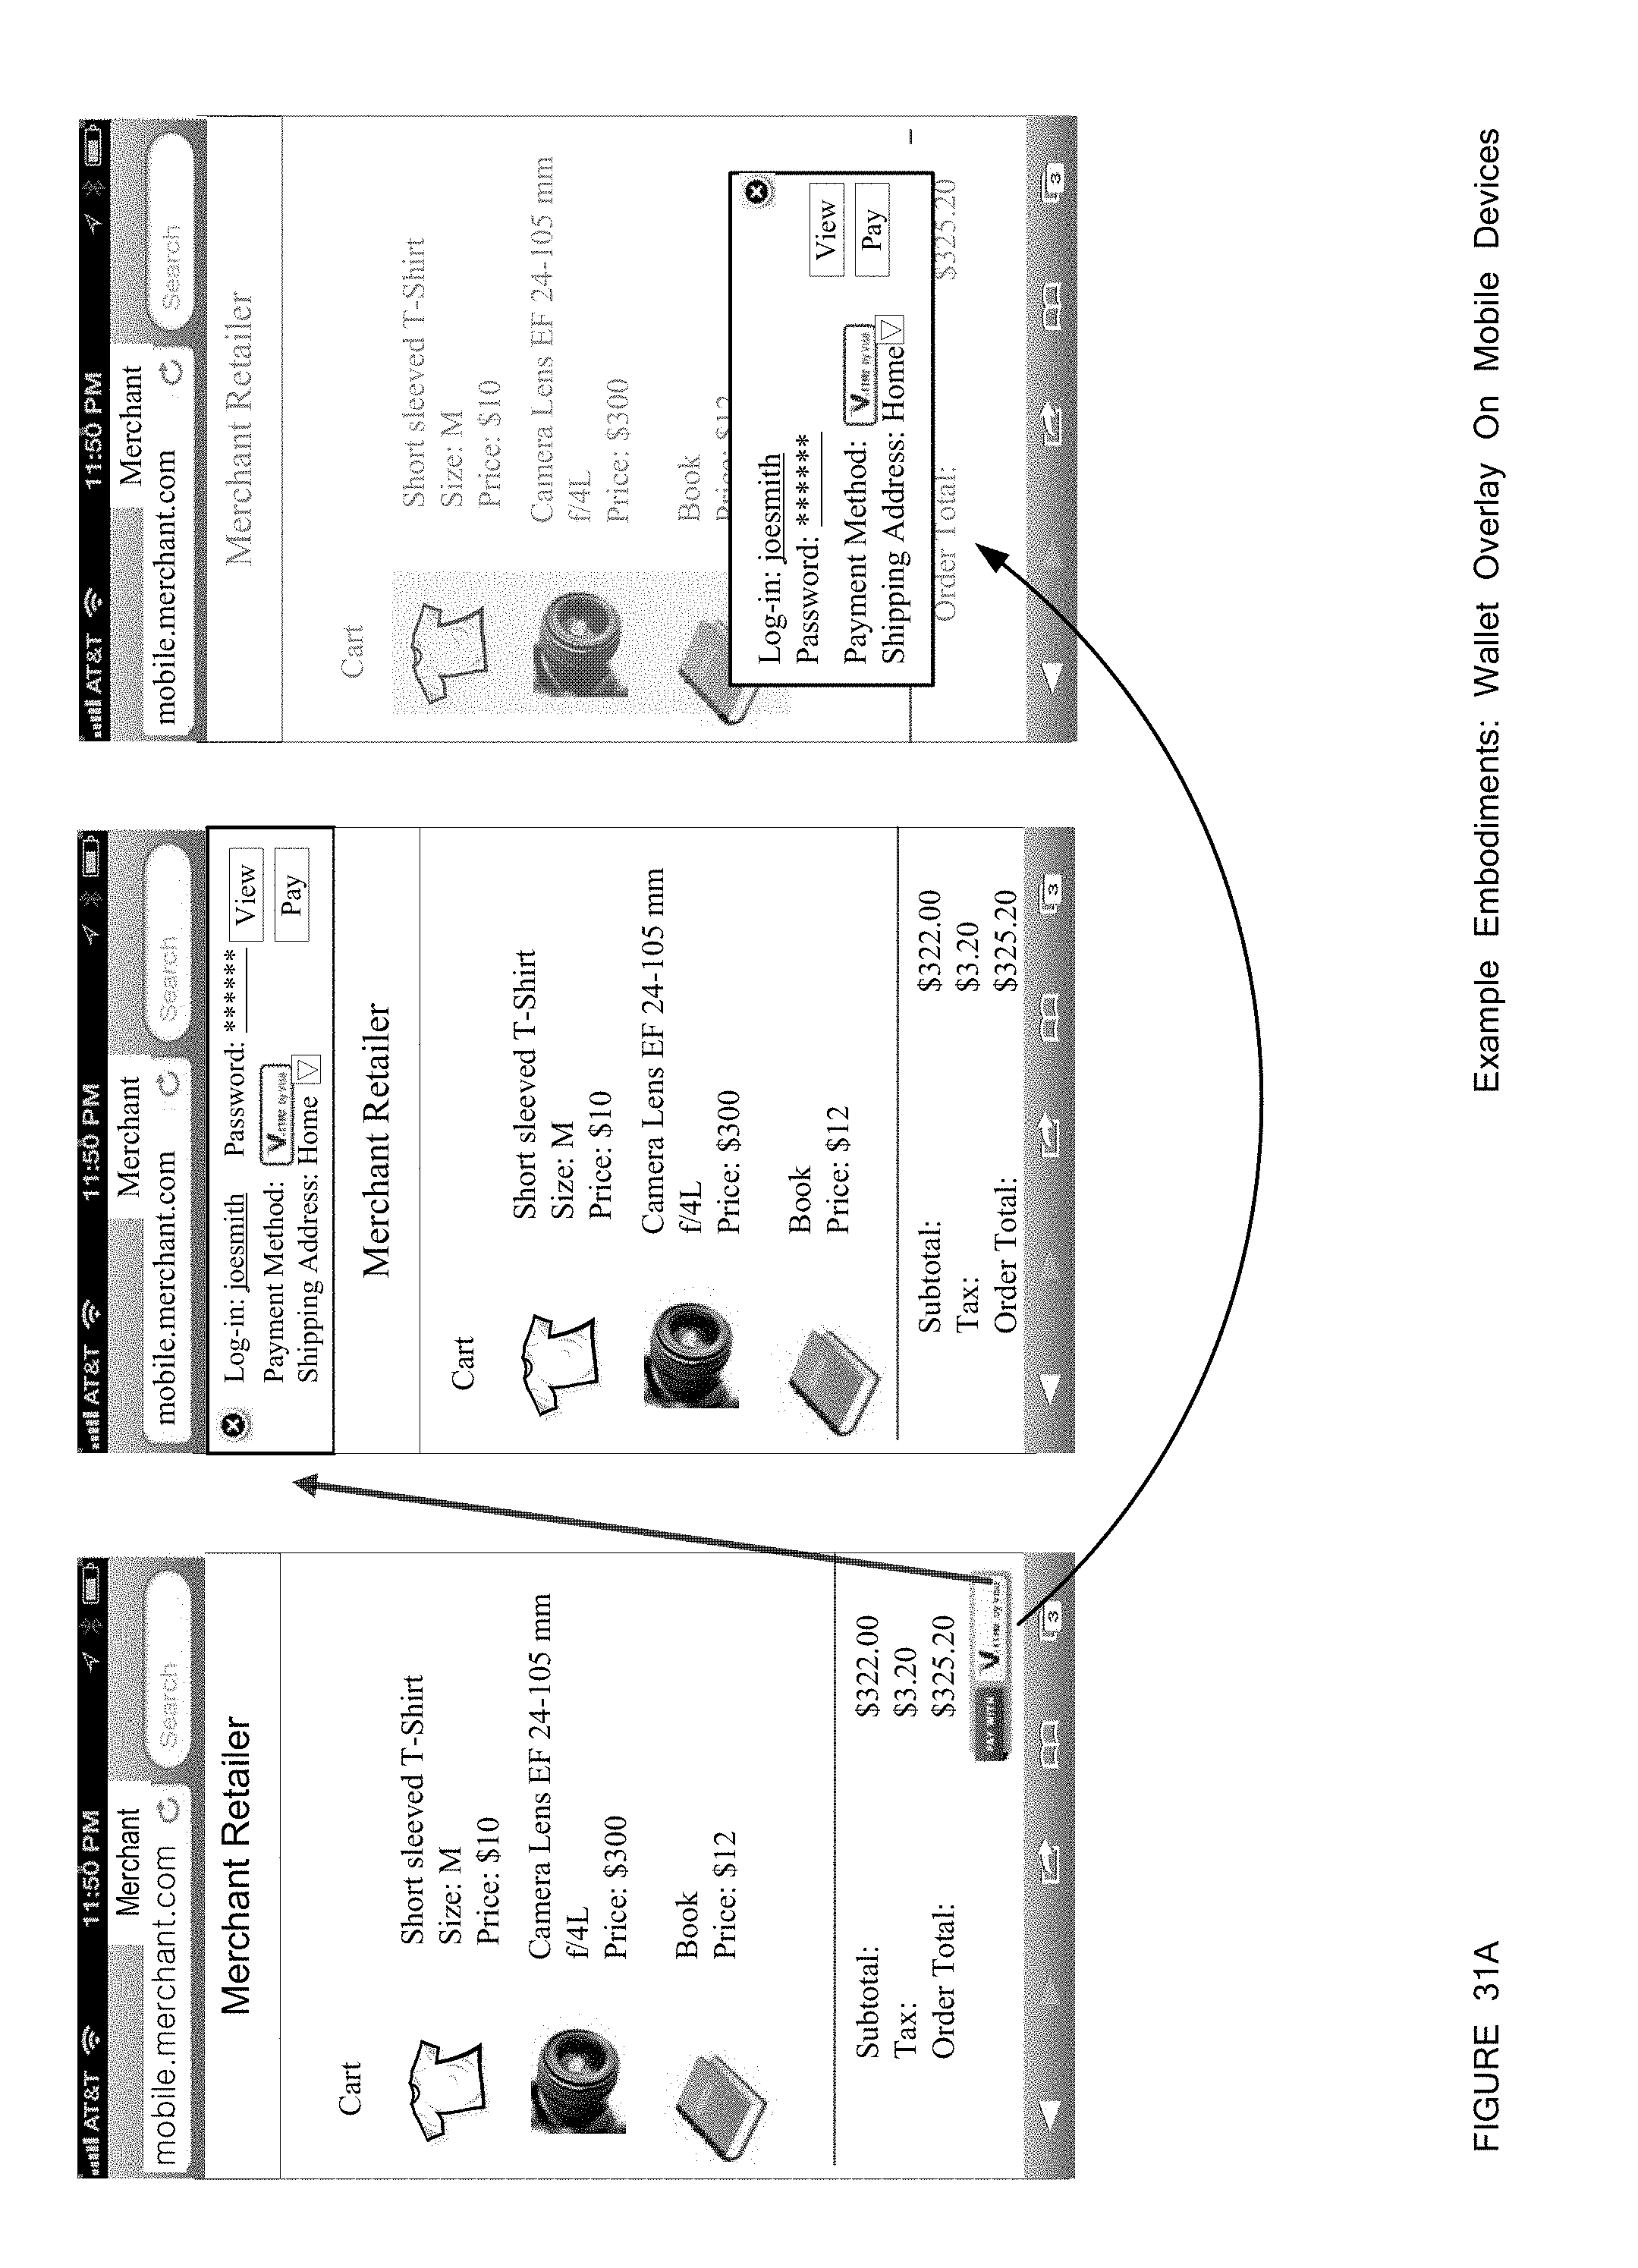 Patent US 9,710,807 B2